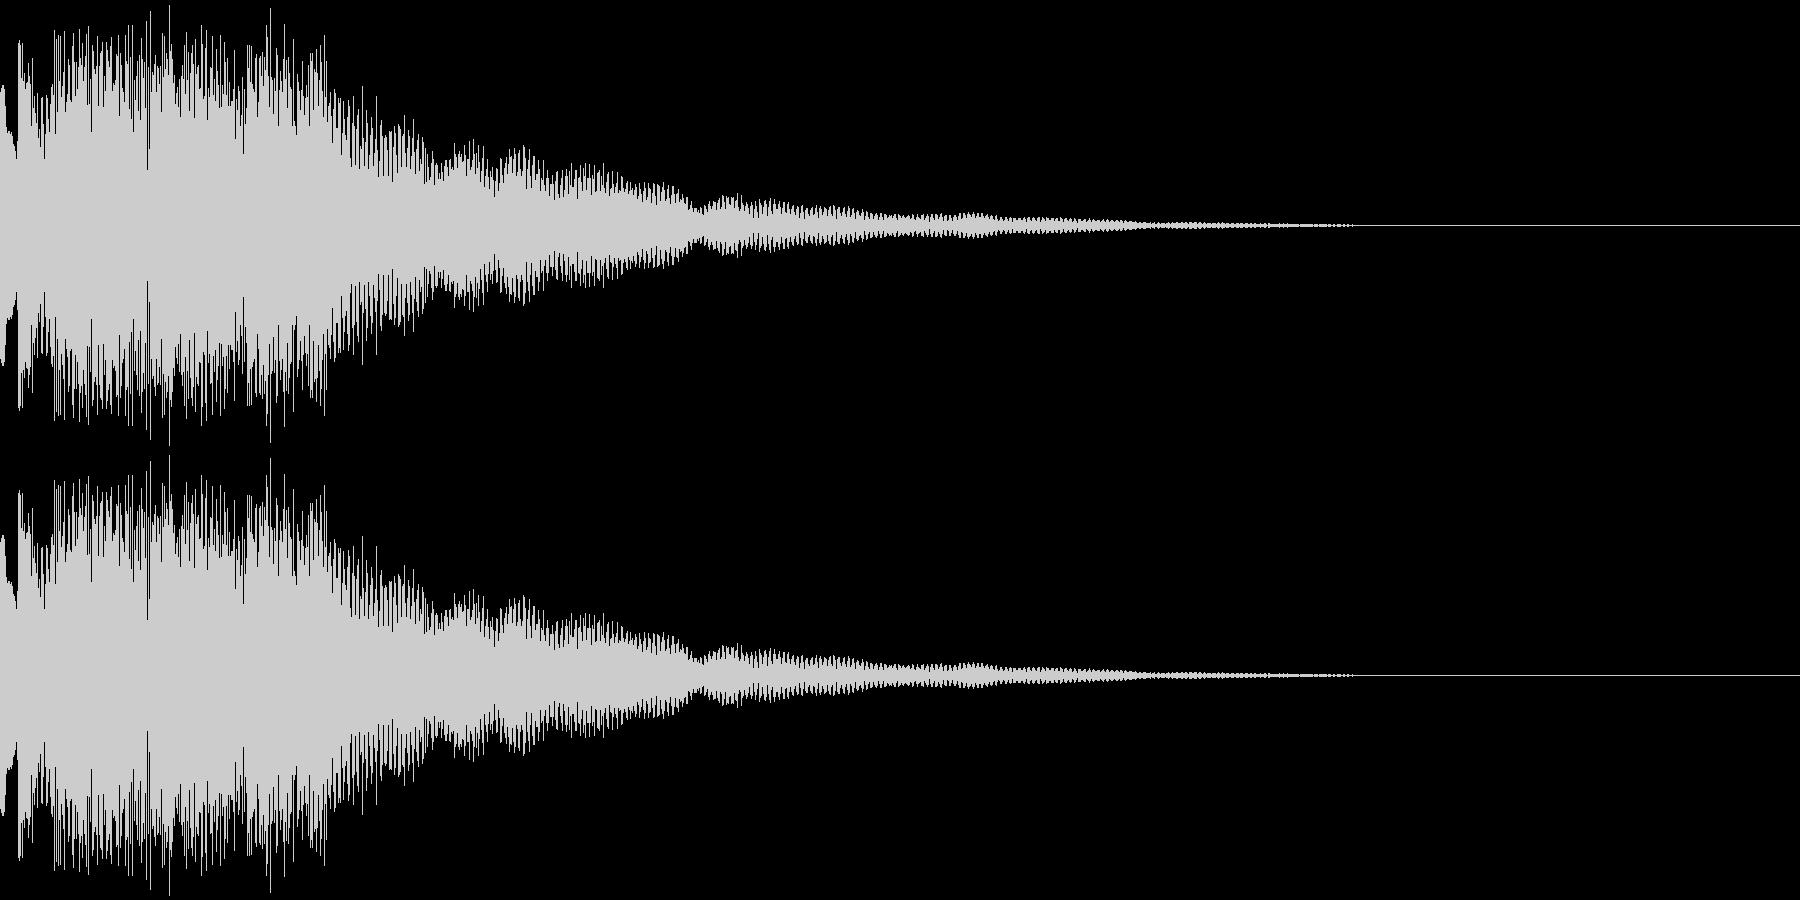 ティロロンティロロンティロロンの未再生の波形